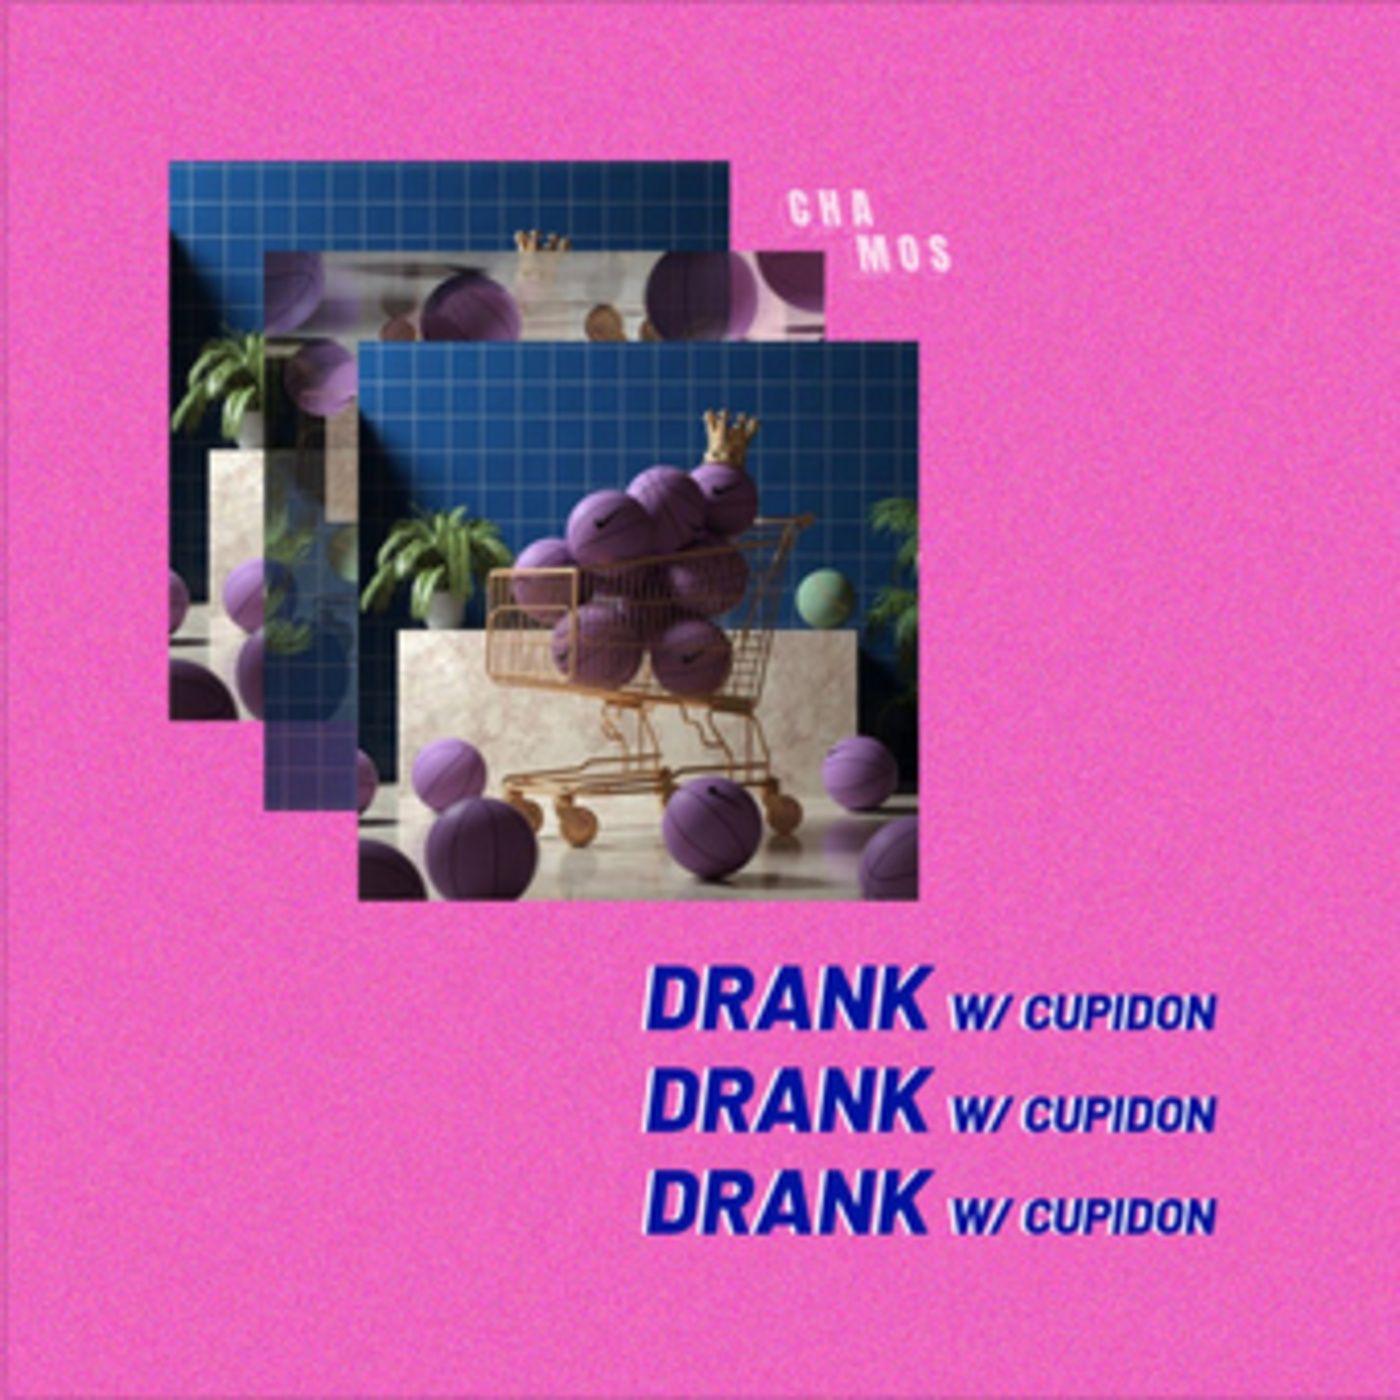 Kendrick Lamar X CHAMOS & Cupidon - DRANK